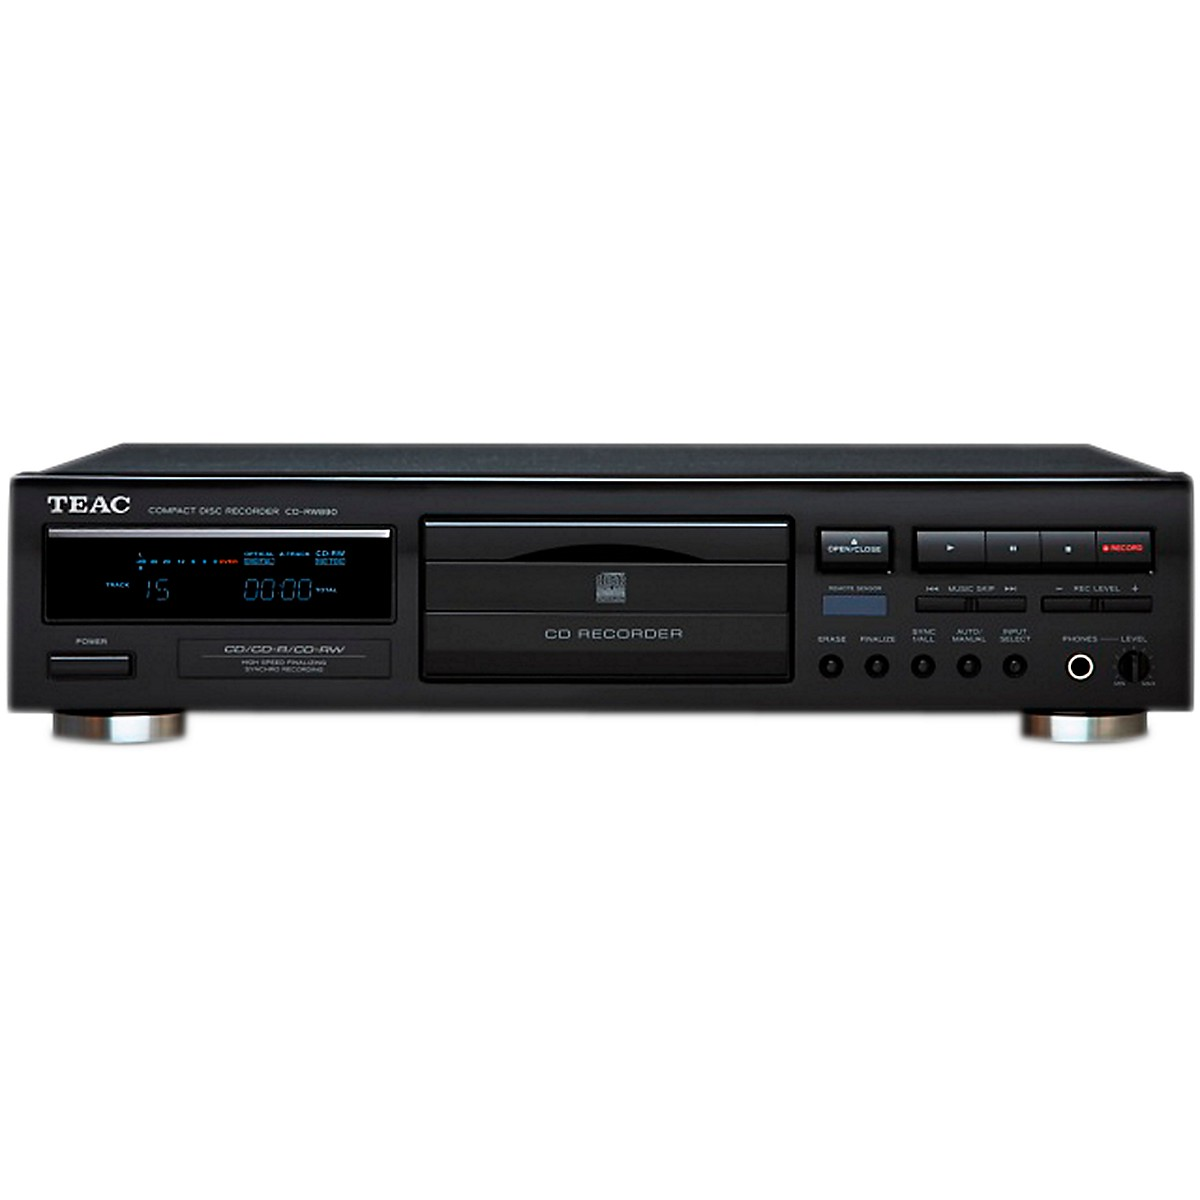 TEAC CD-RW890 Consumer CD Recorder/Player